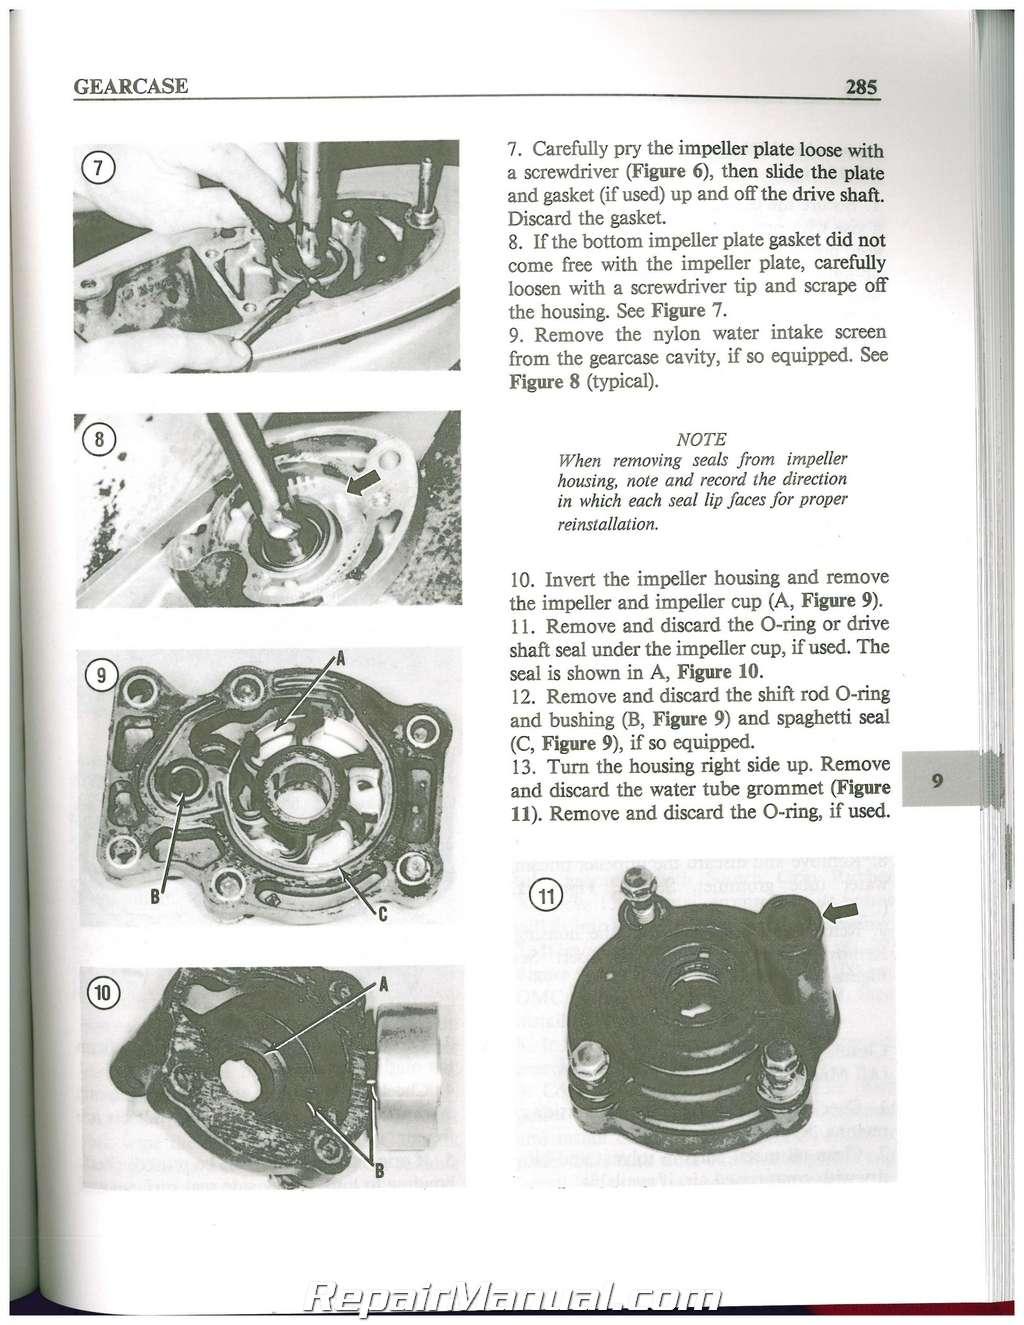 johnson evinrude service manual free